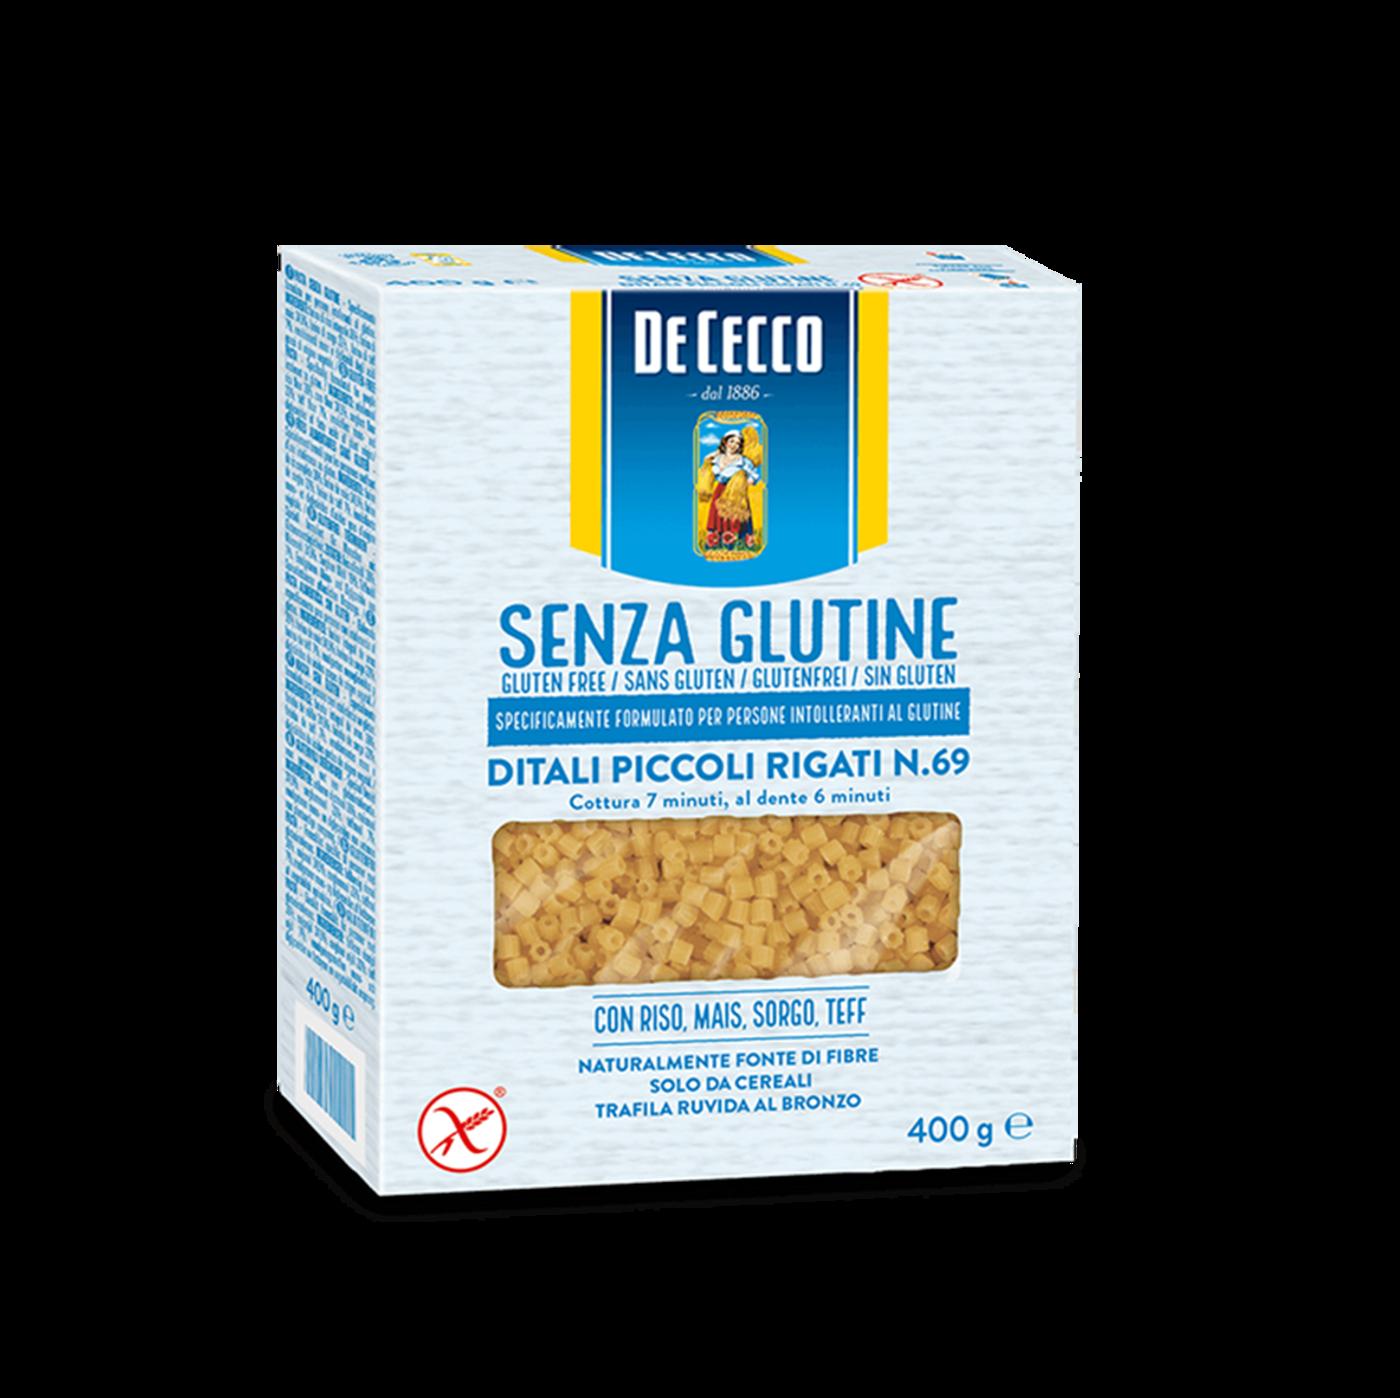 Ditali Piccoli Rigati Nº69 Sin Gluten